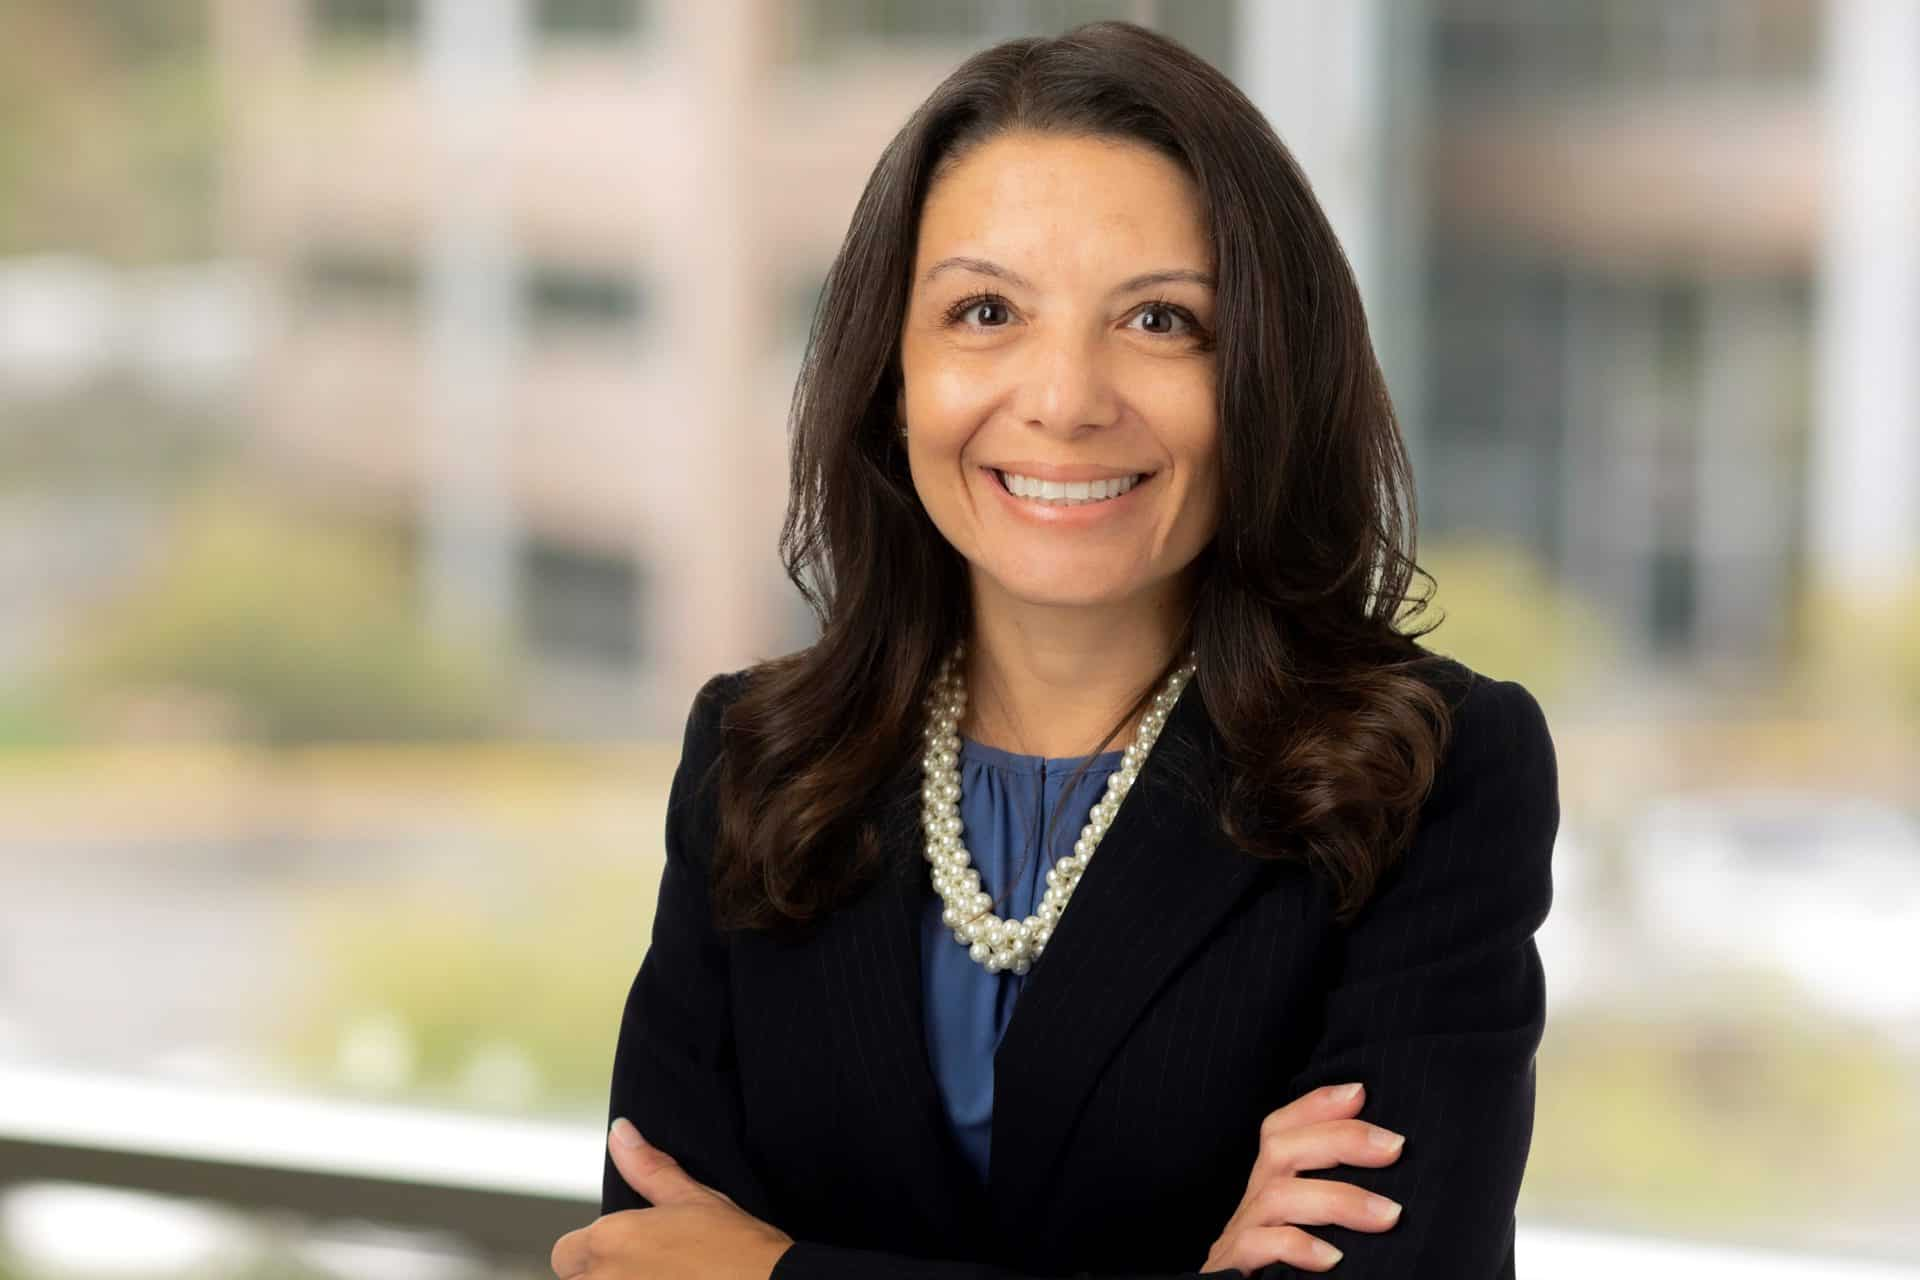 Angela L. Mastrangelo, Esquire Joins Hyland Levin Shapiro